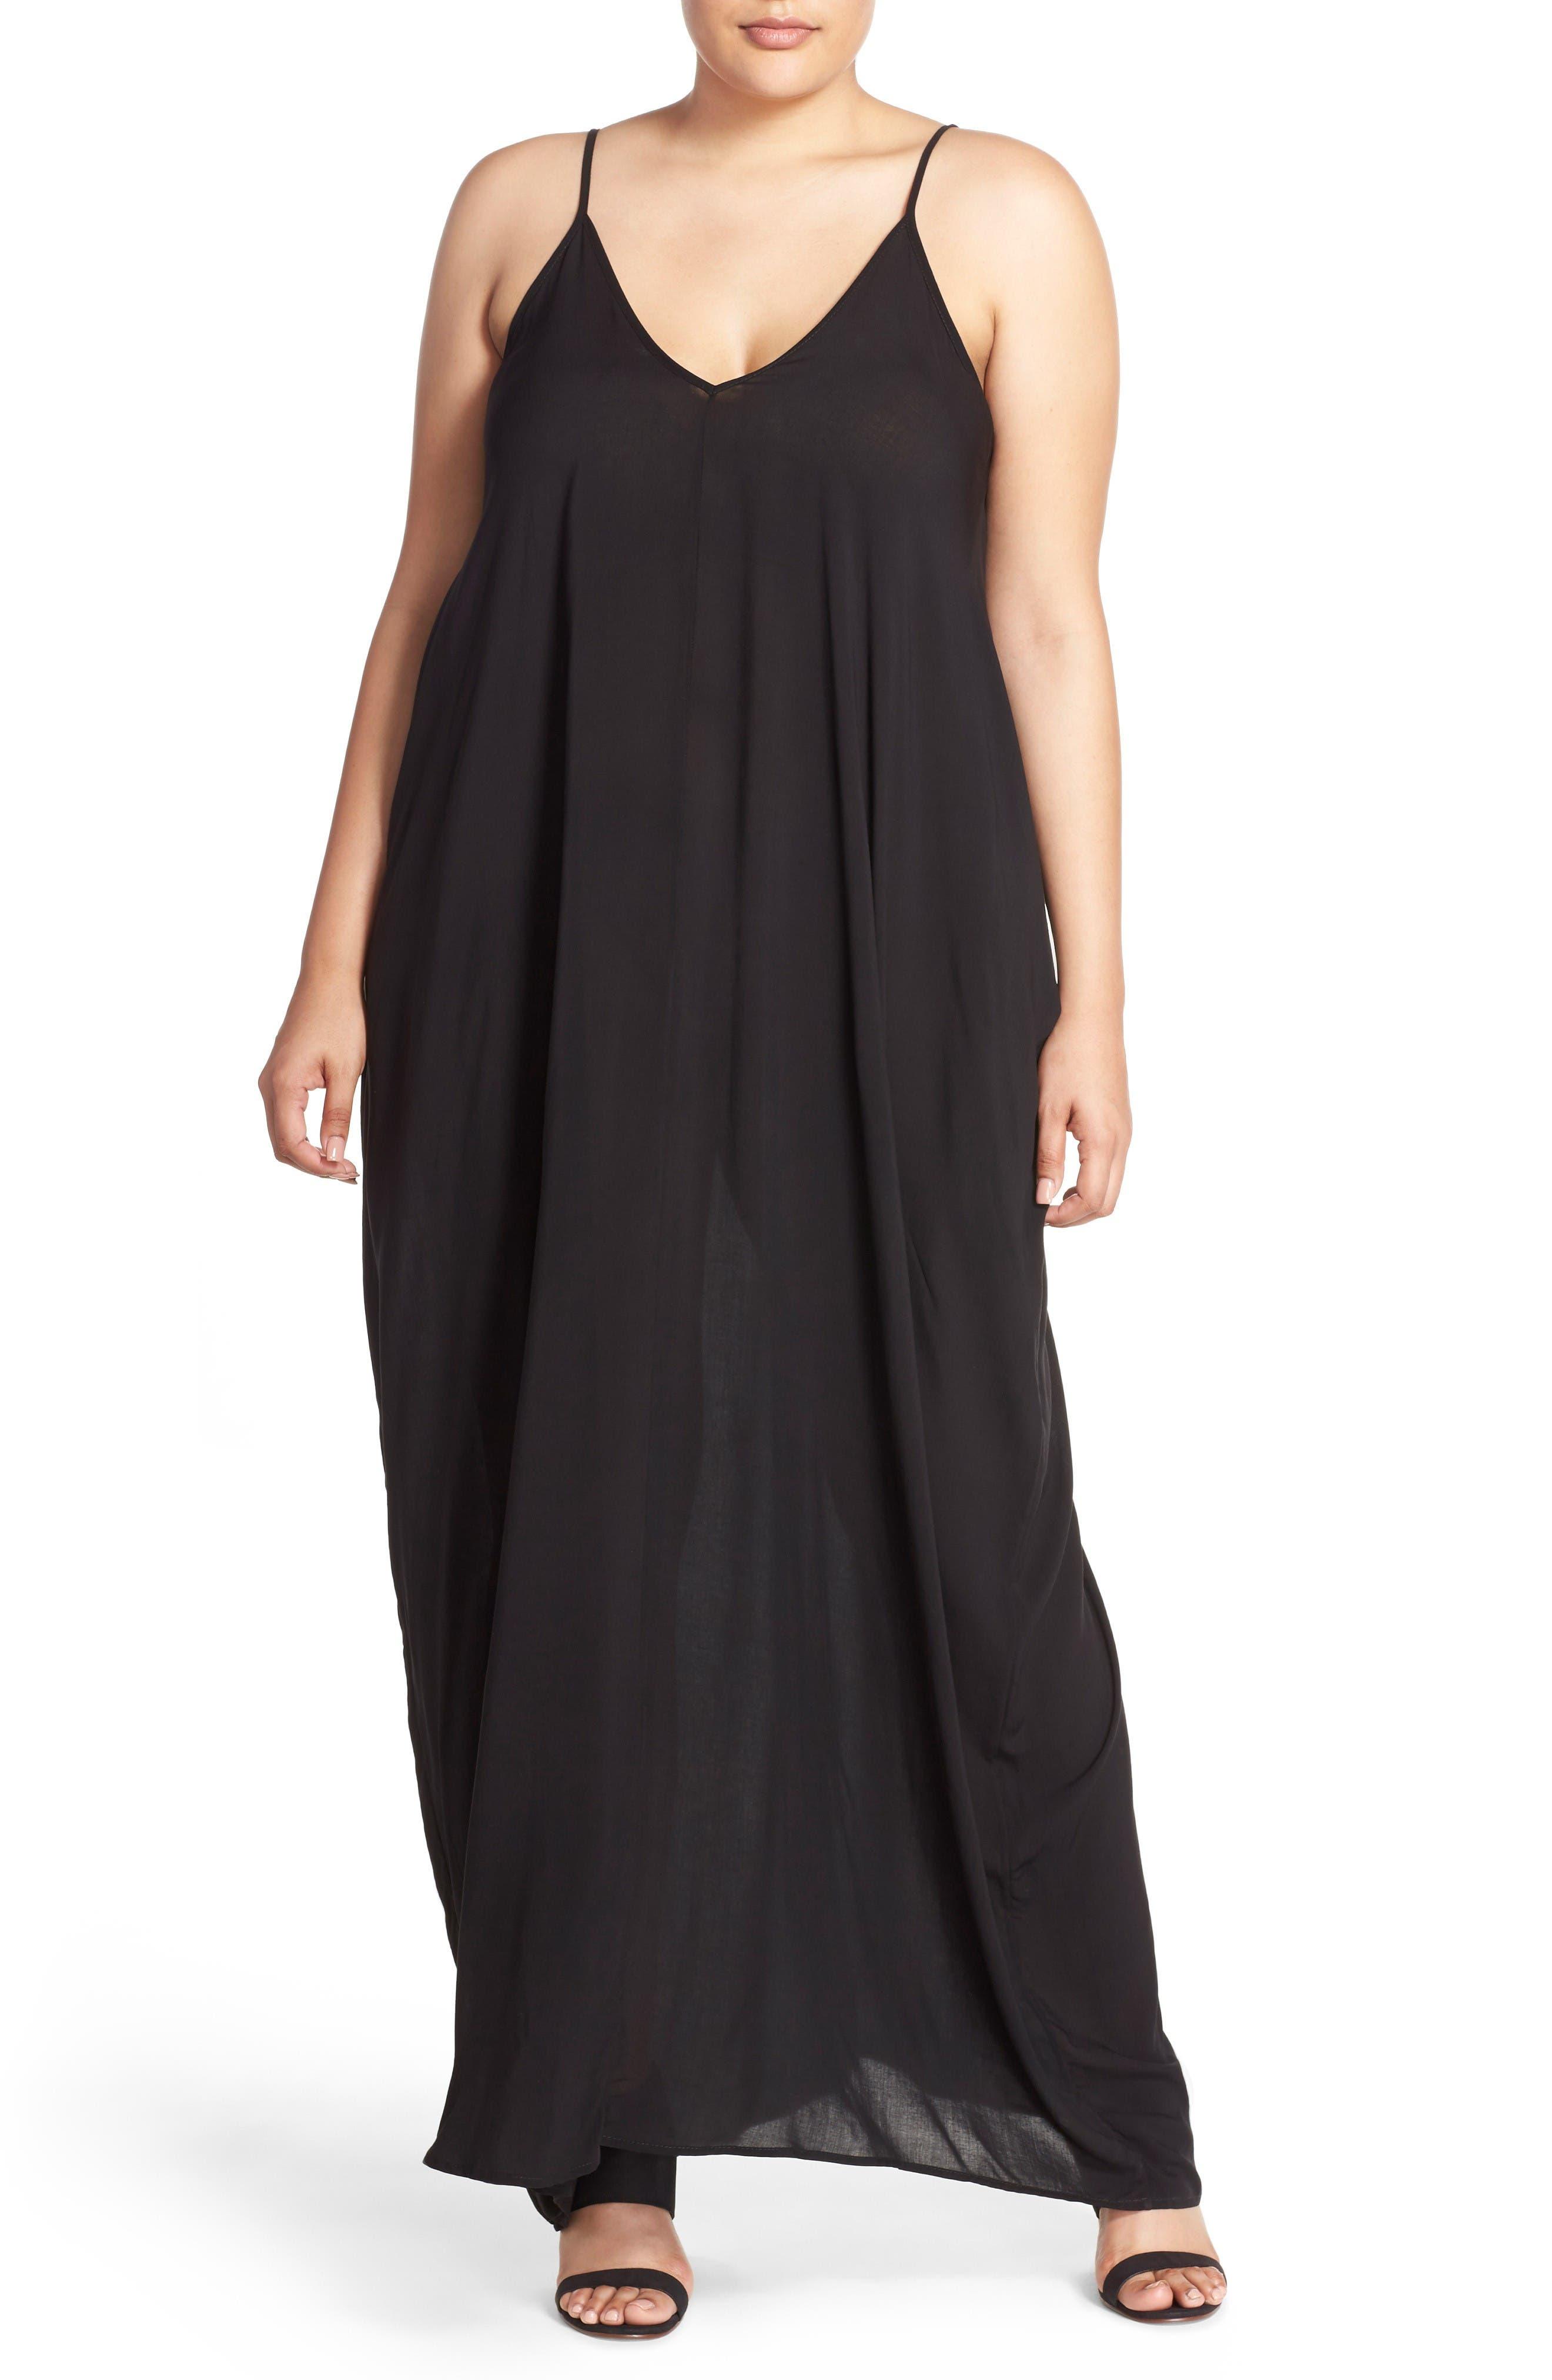 Alternate Image 1 Selected - Elan Cover-Up Maxi Dress (Plus Size)